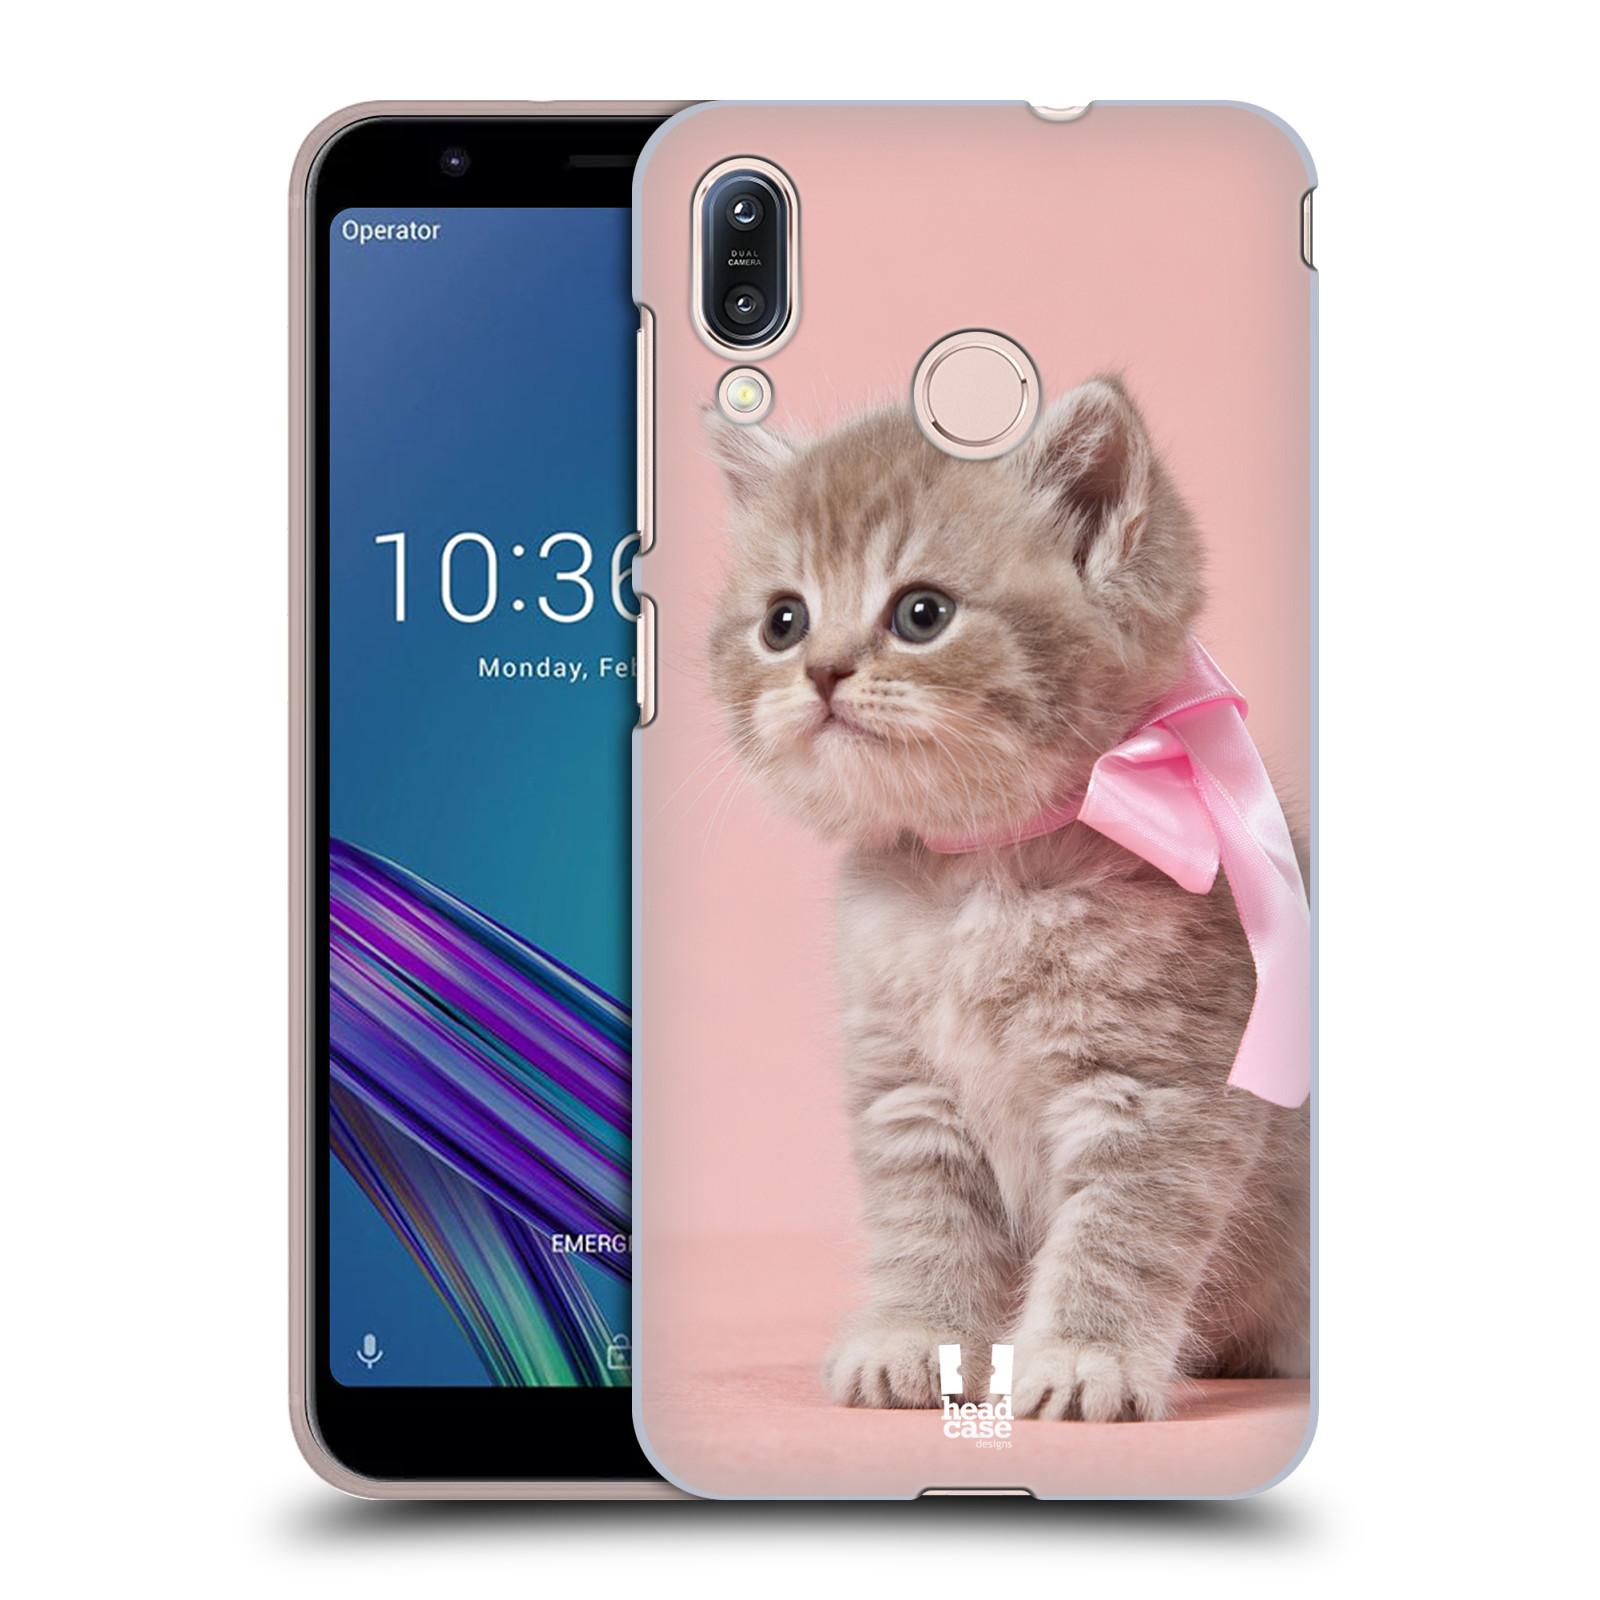 Pouzdro na mobil Asus Zenfone Max M1 (ZB555KL) - HEAD CASE - vzor Kočičky koťata foto kotě s růžovou mašlí